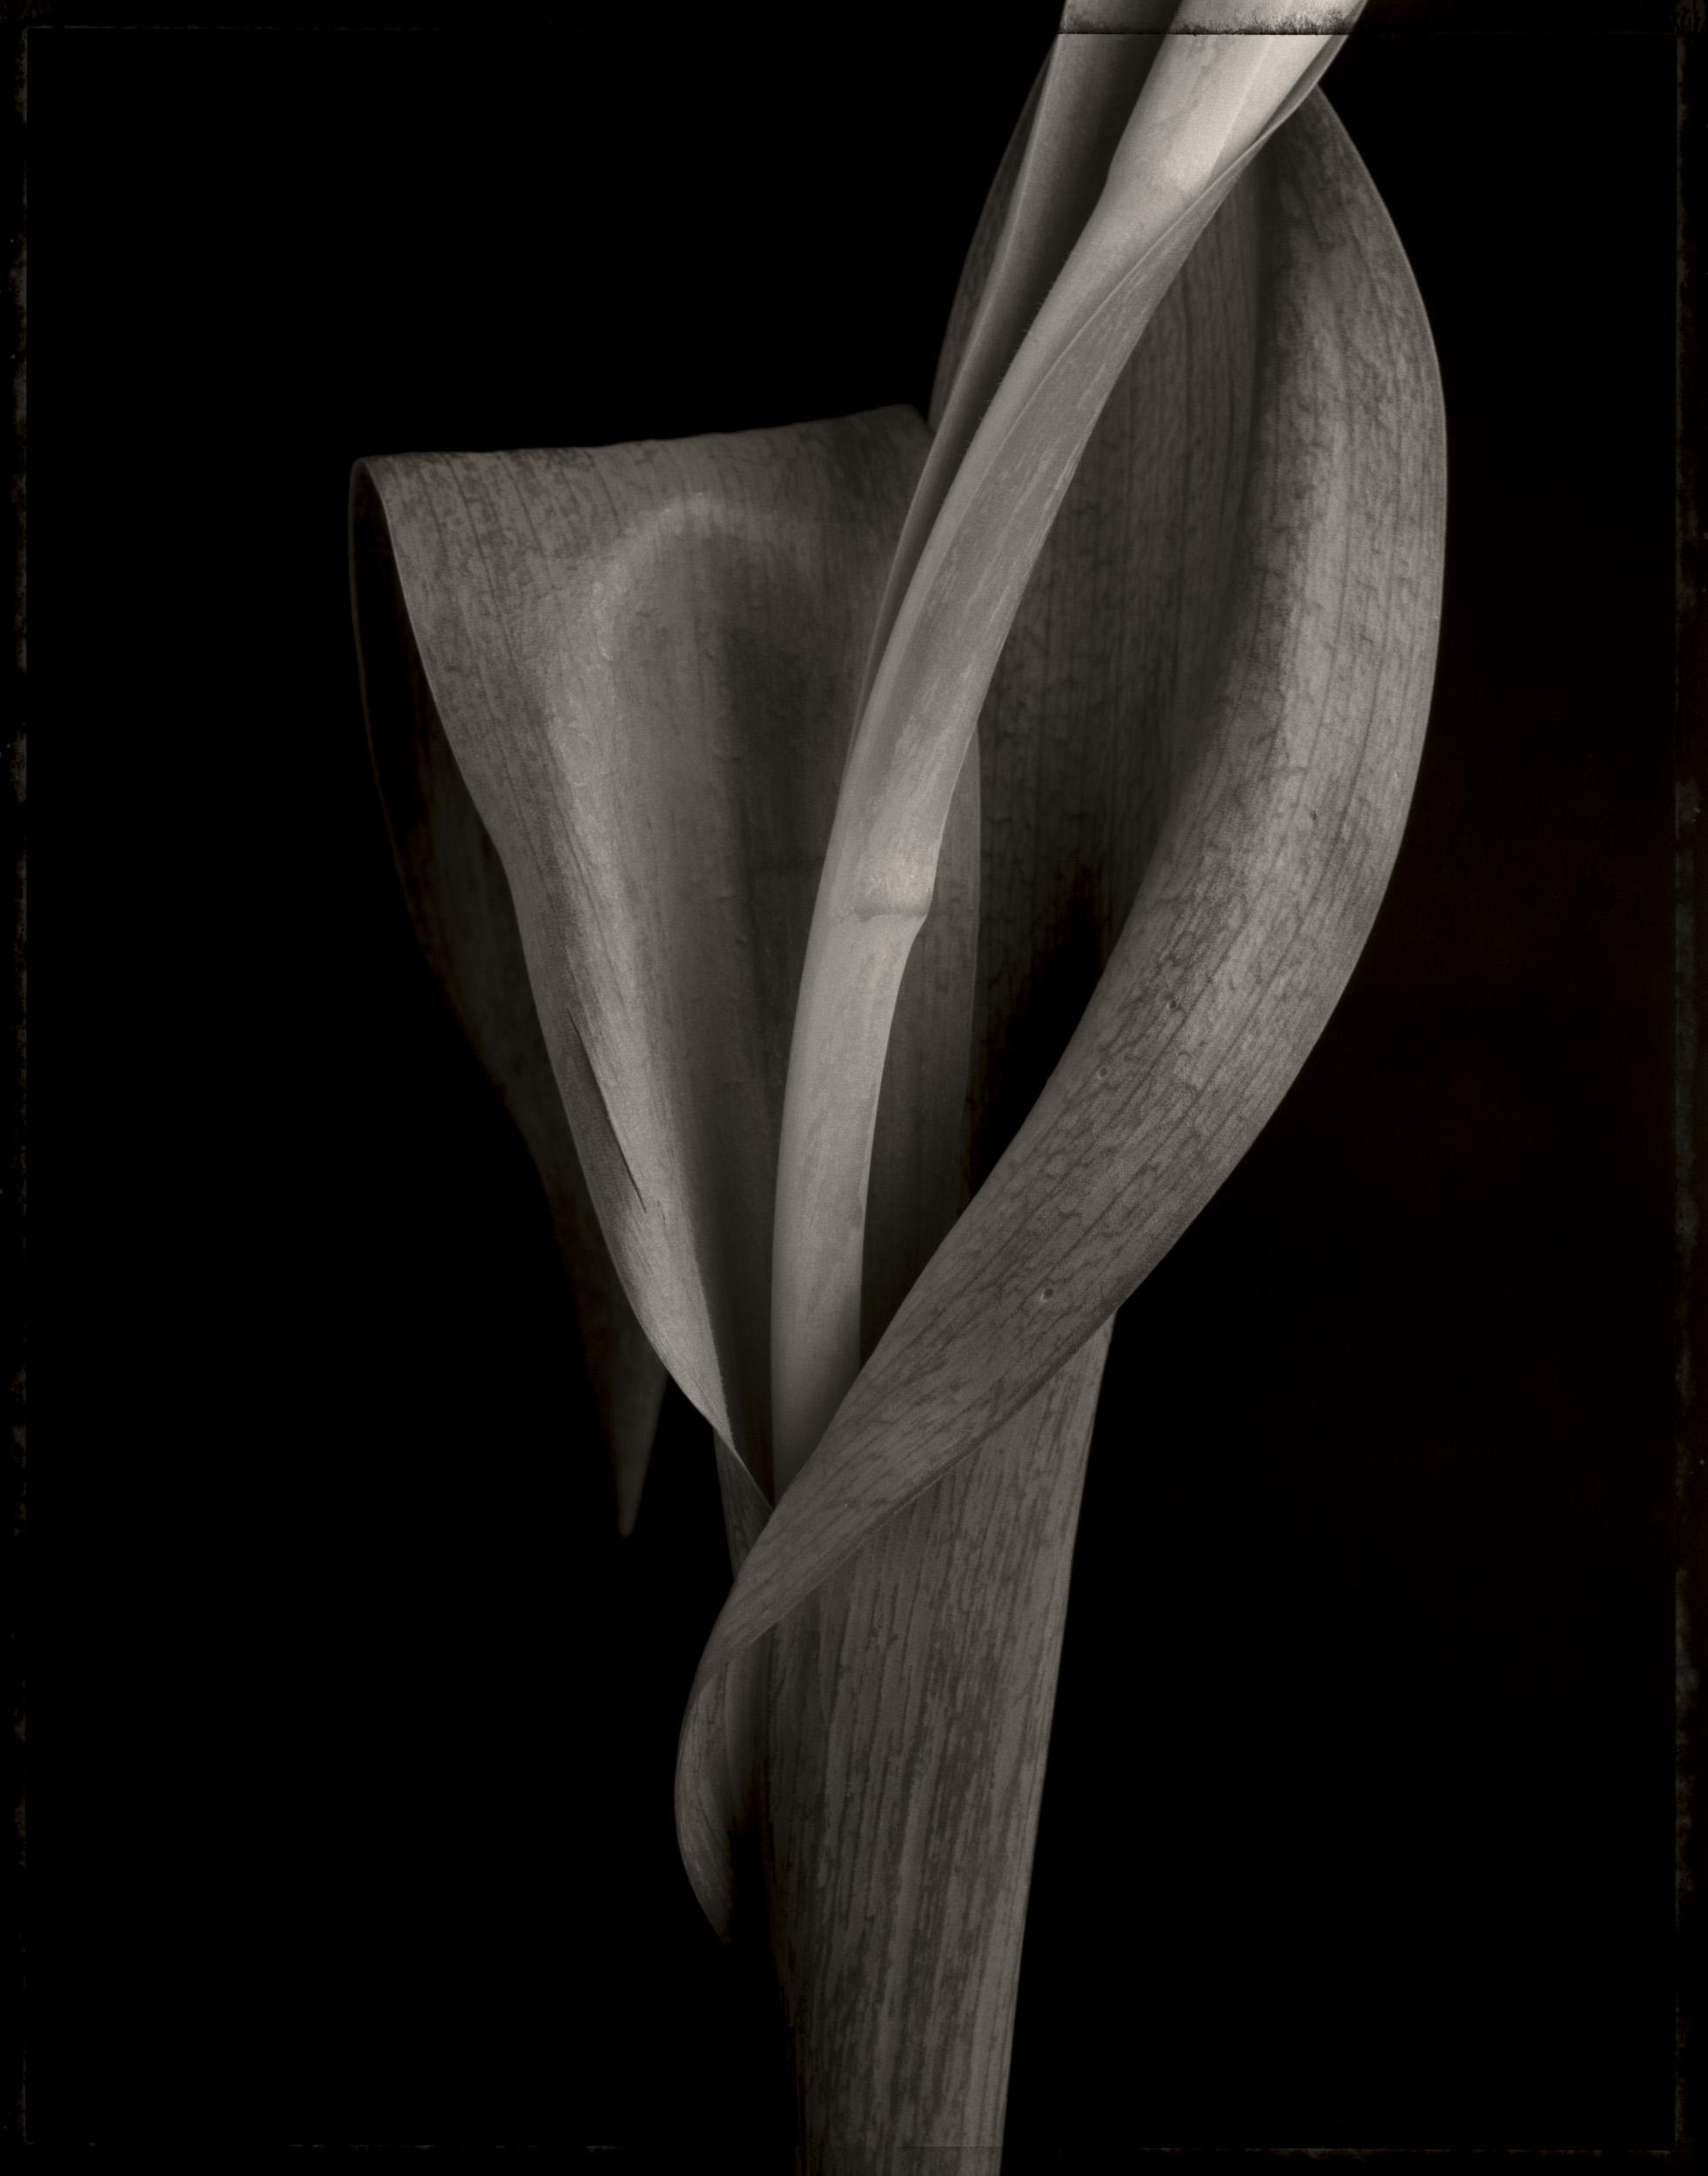 tulip_stem_print12.jpg